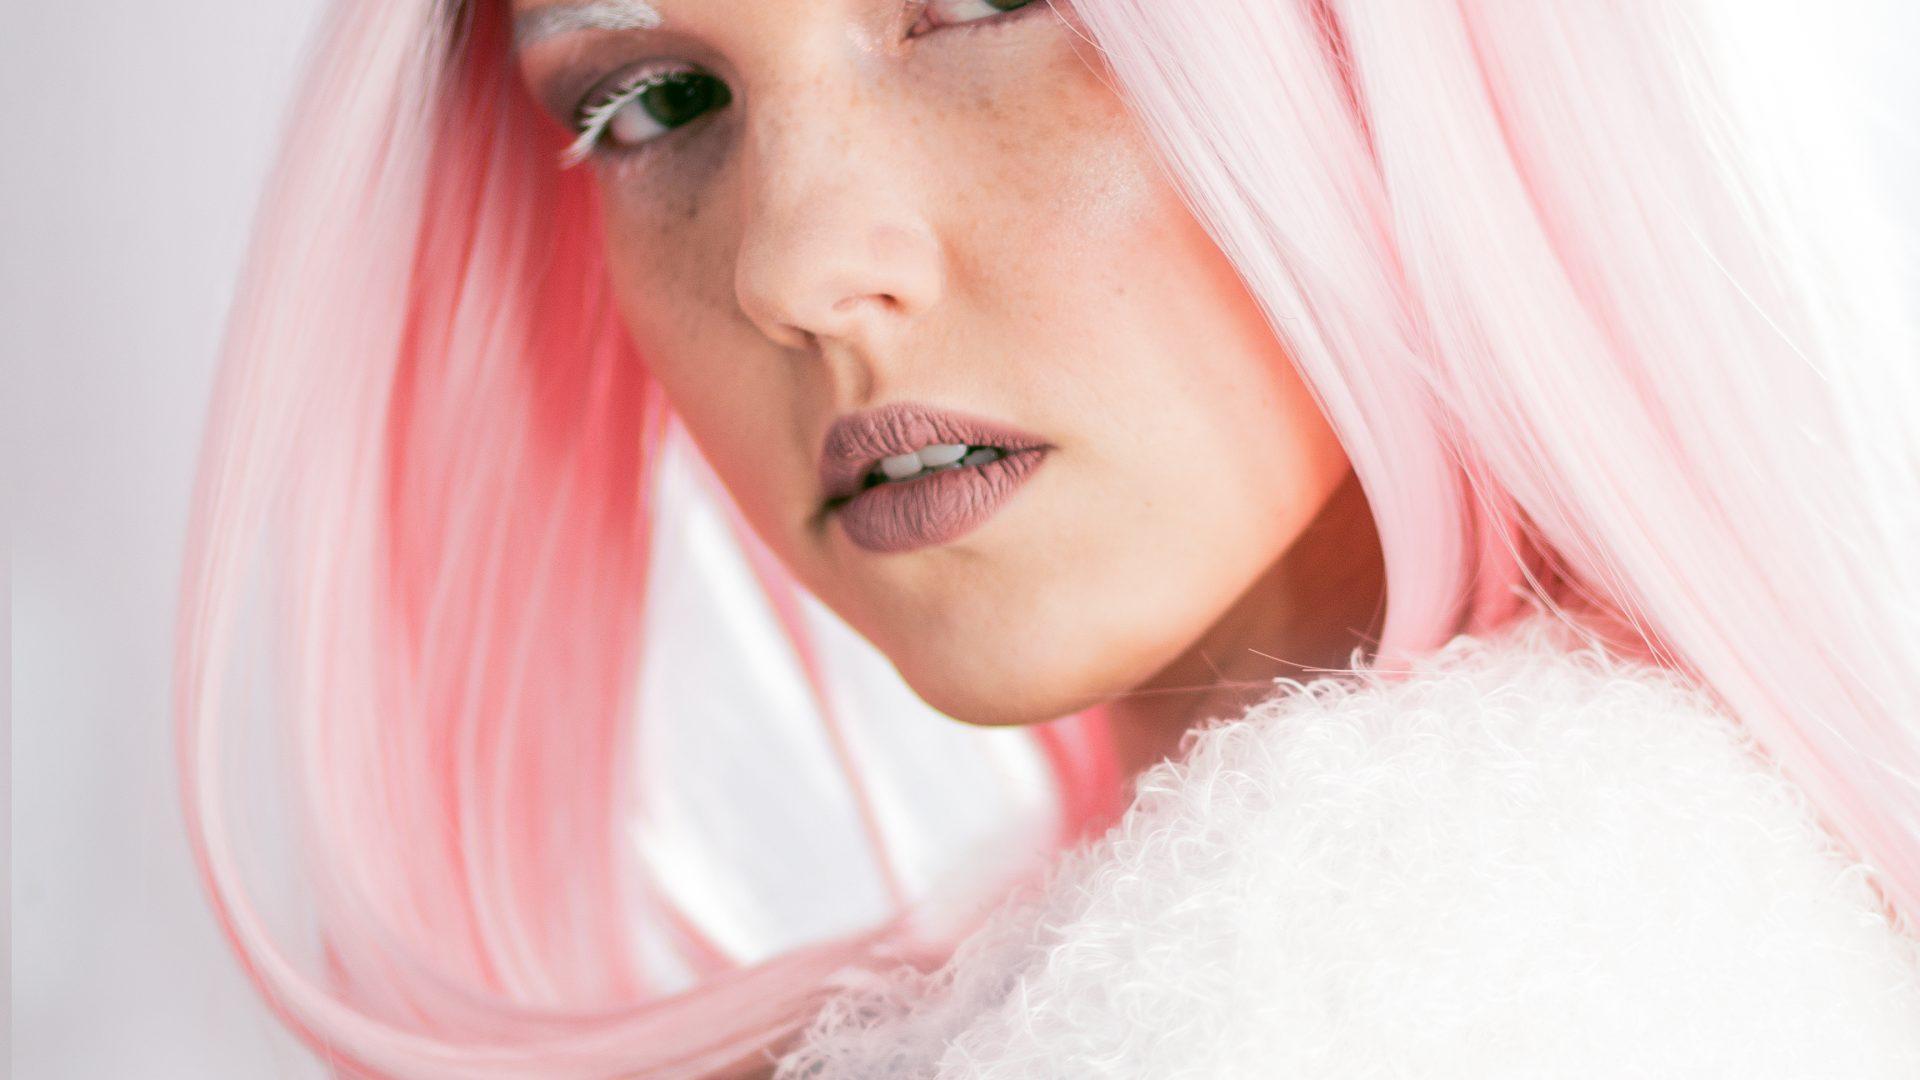 Sesja zdjęciowa - White & Pink